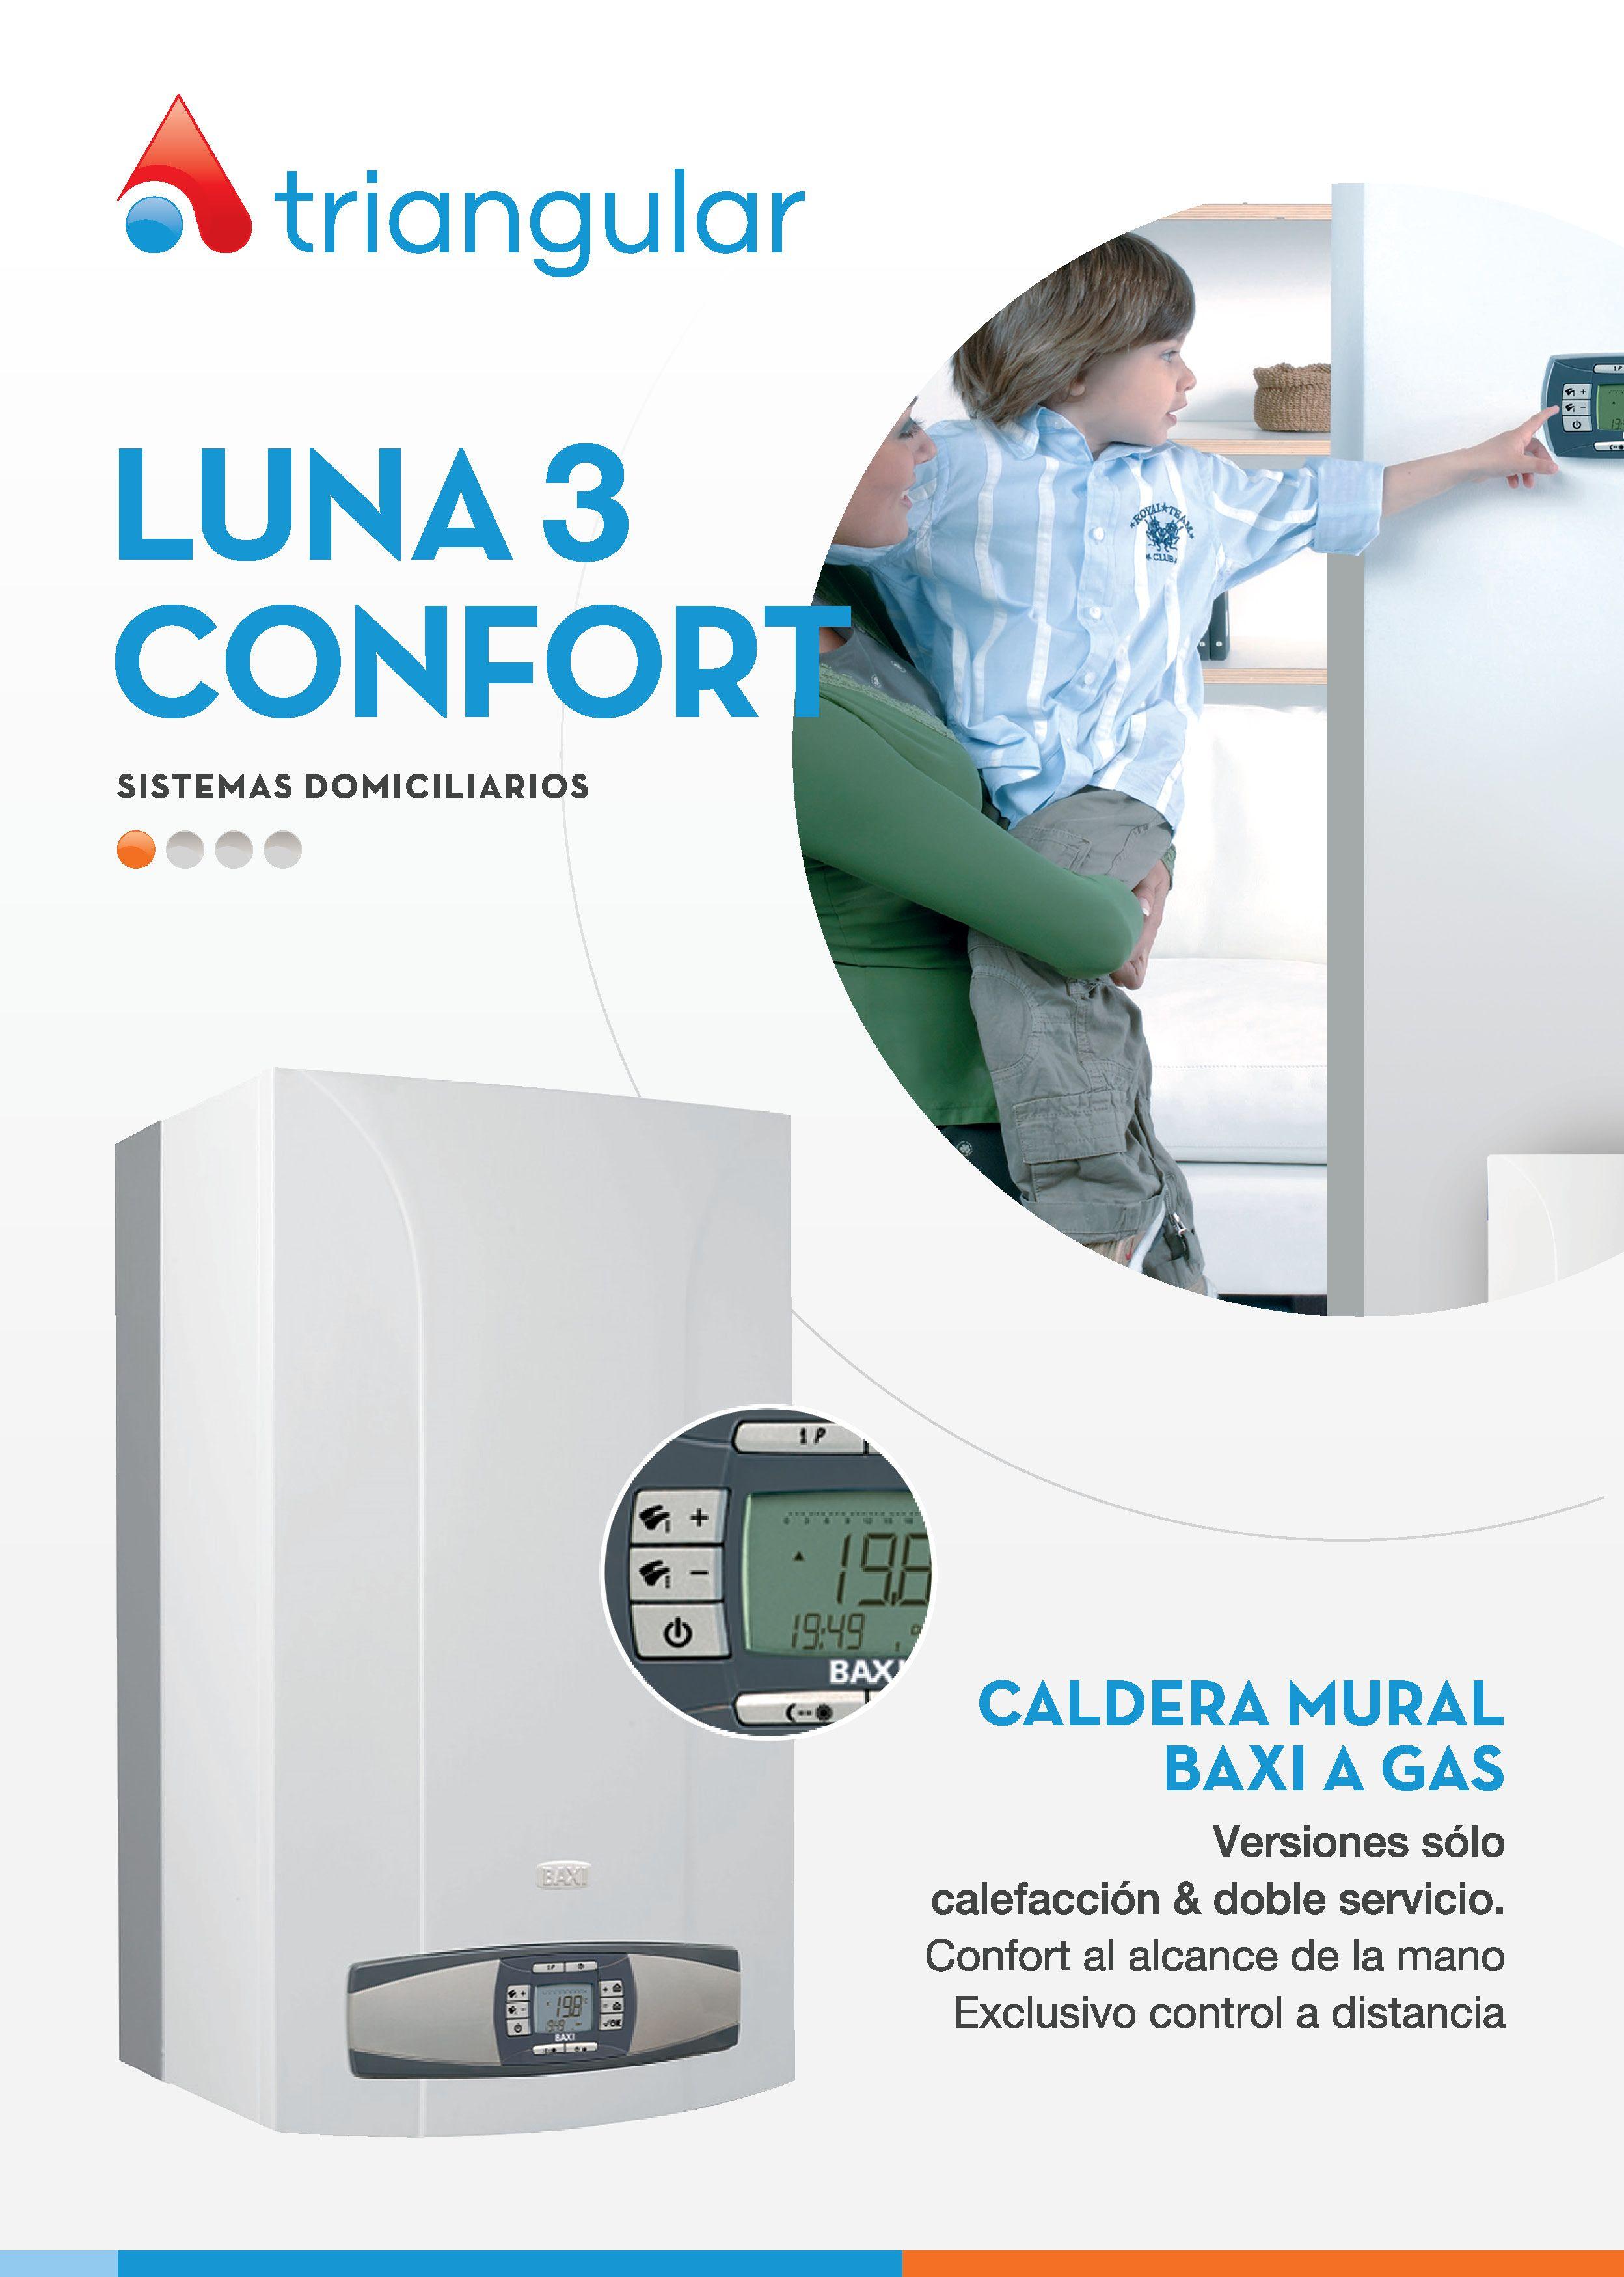 Luna 3 confort caldera mural para calefacci n a gas for Caldera mural a gas